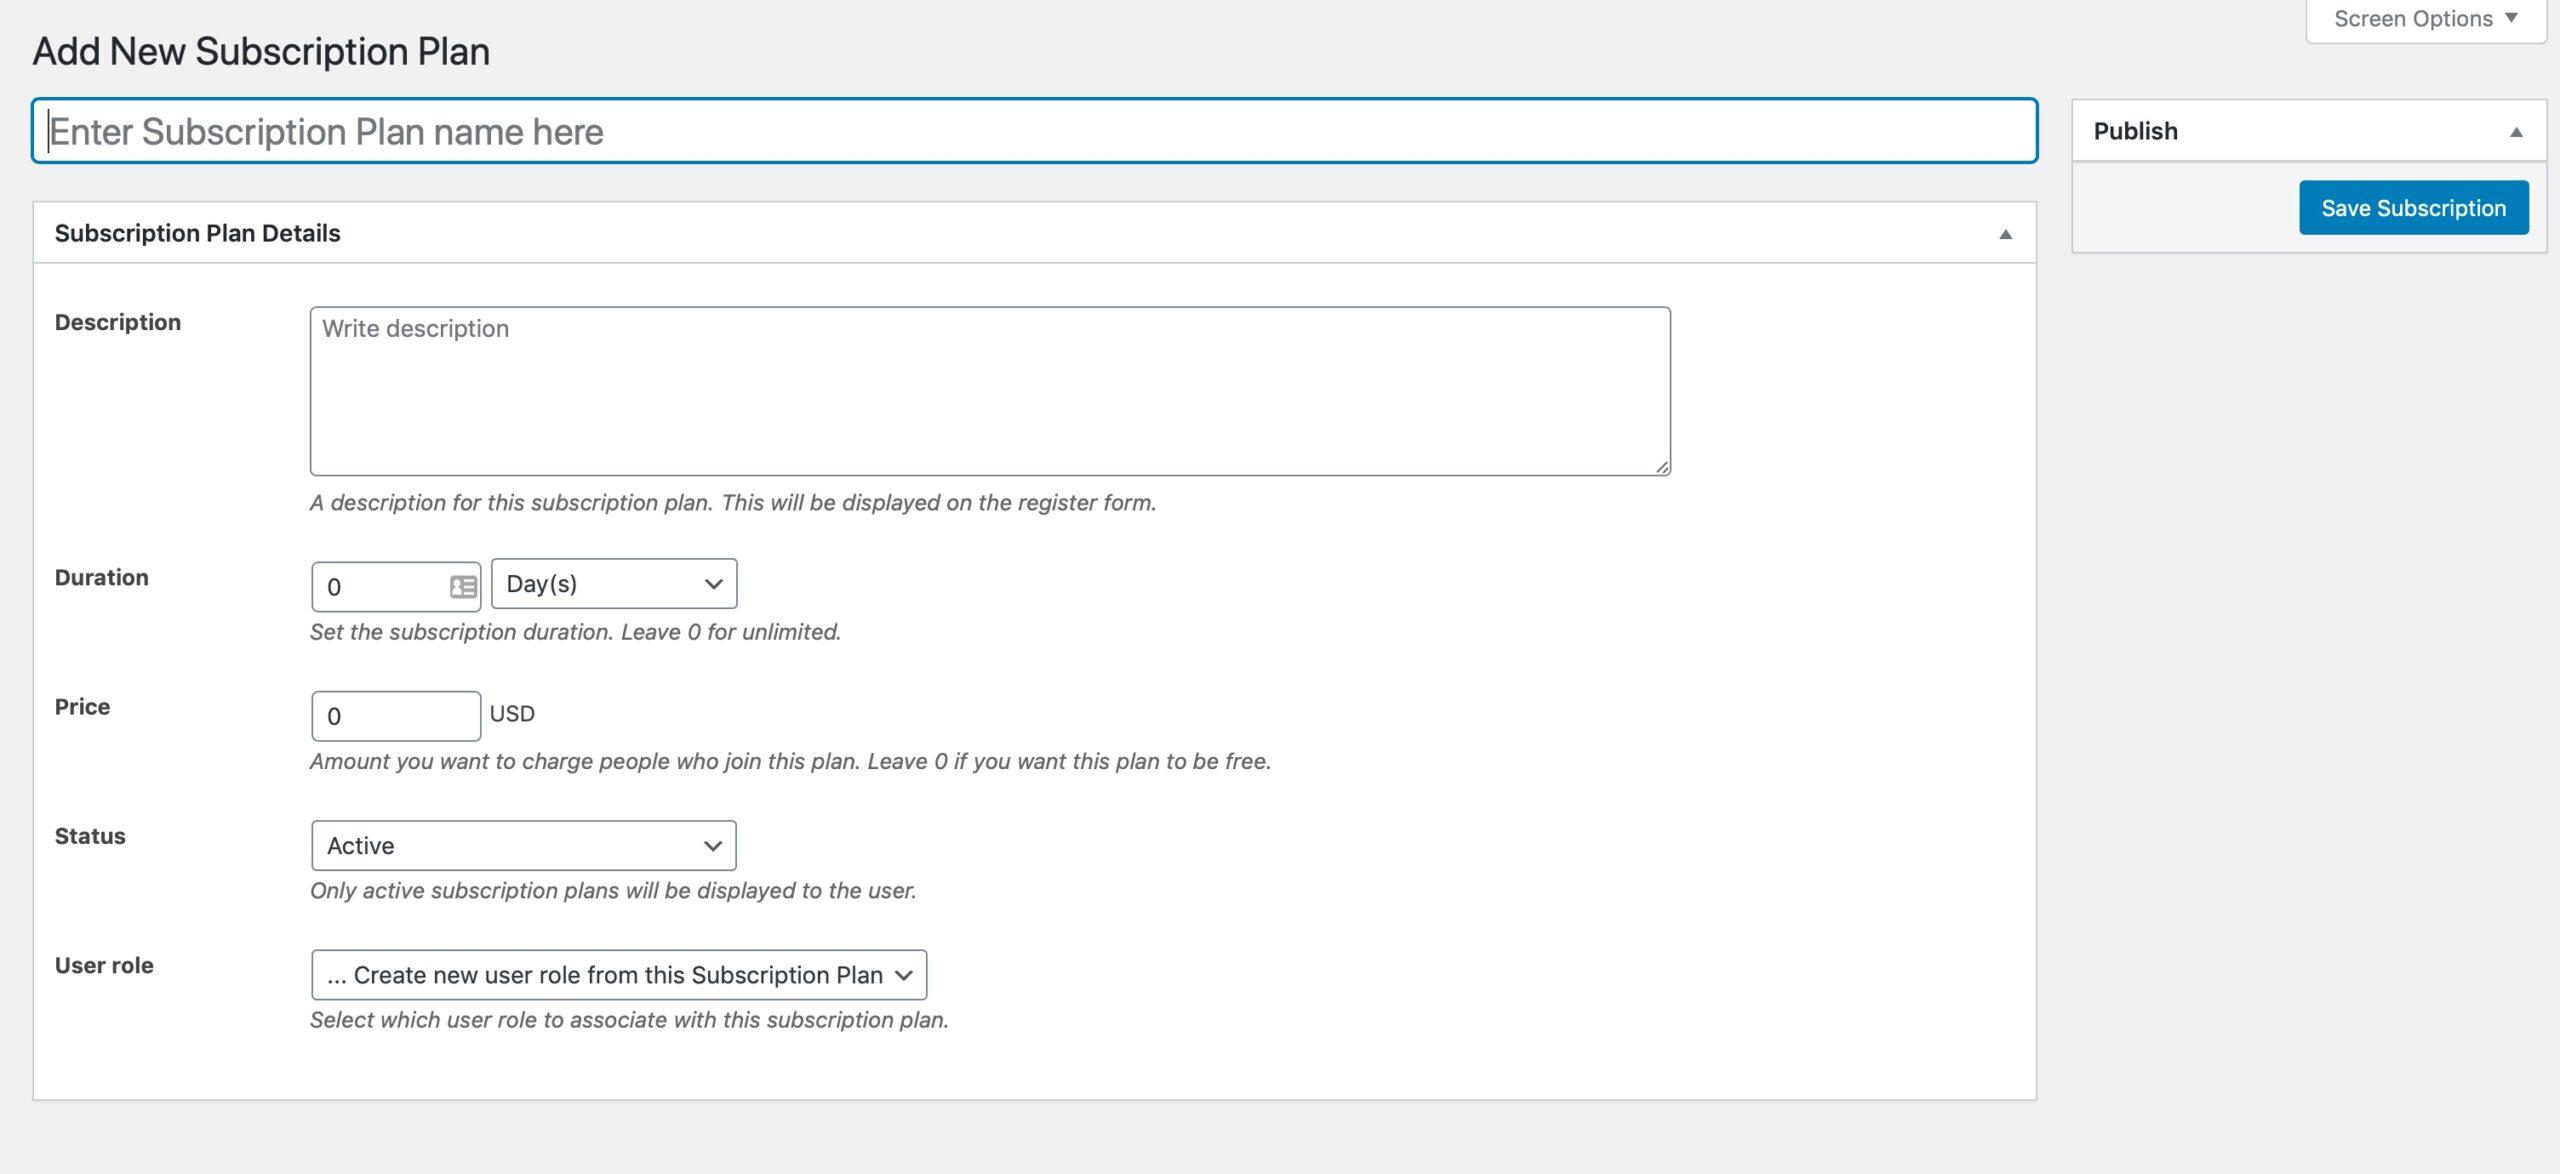 Screenshot of adding a new subscription plan